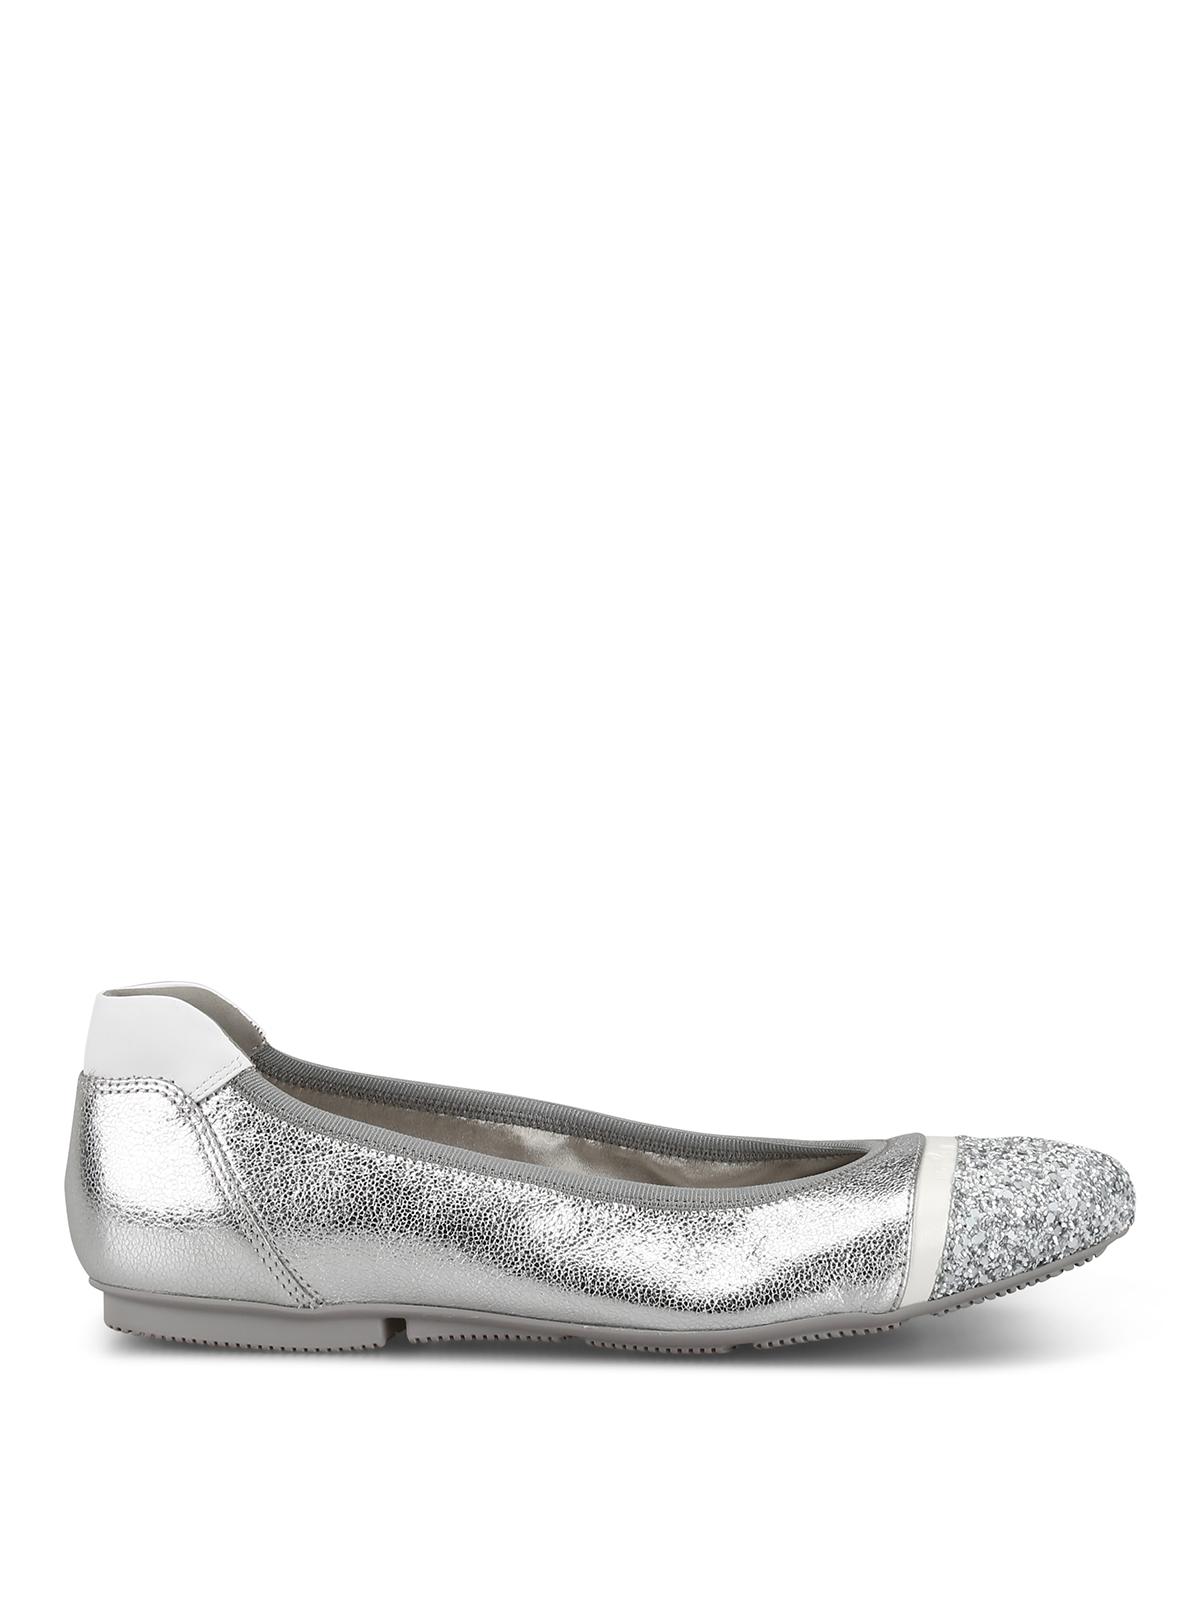 Hogan Wrap-h144 Silver Leather Flats